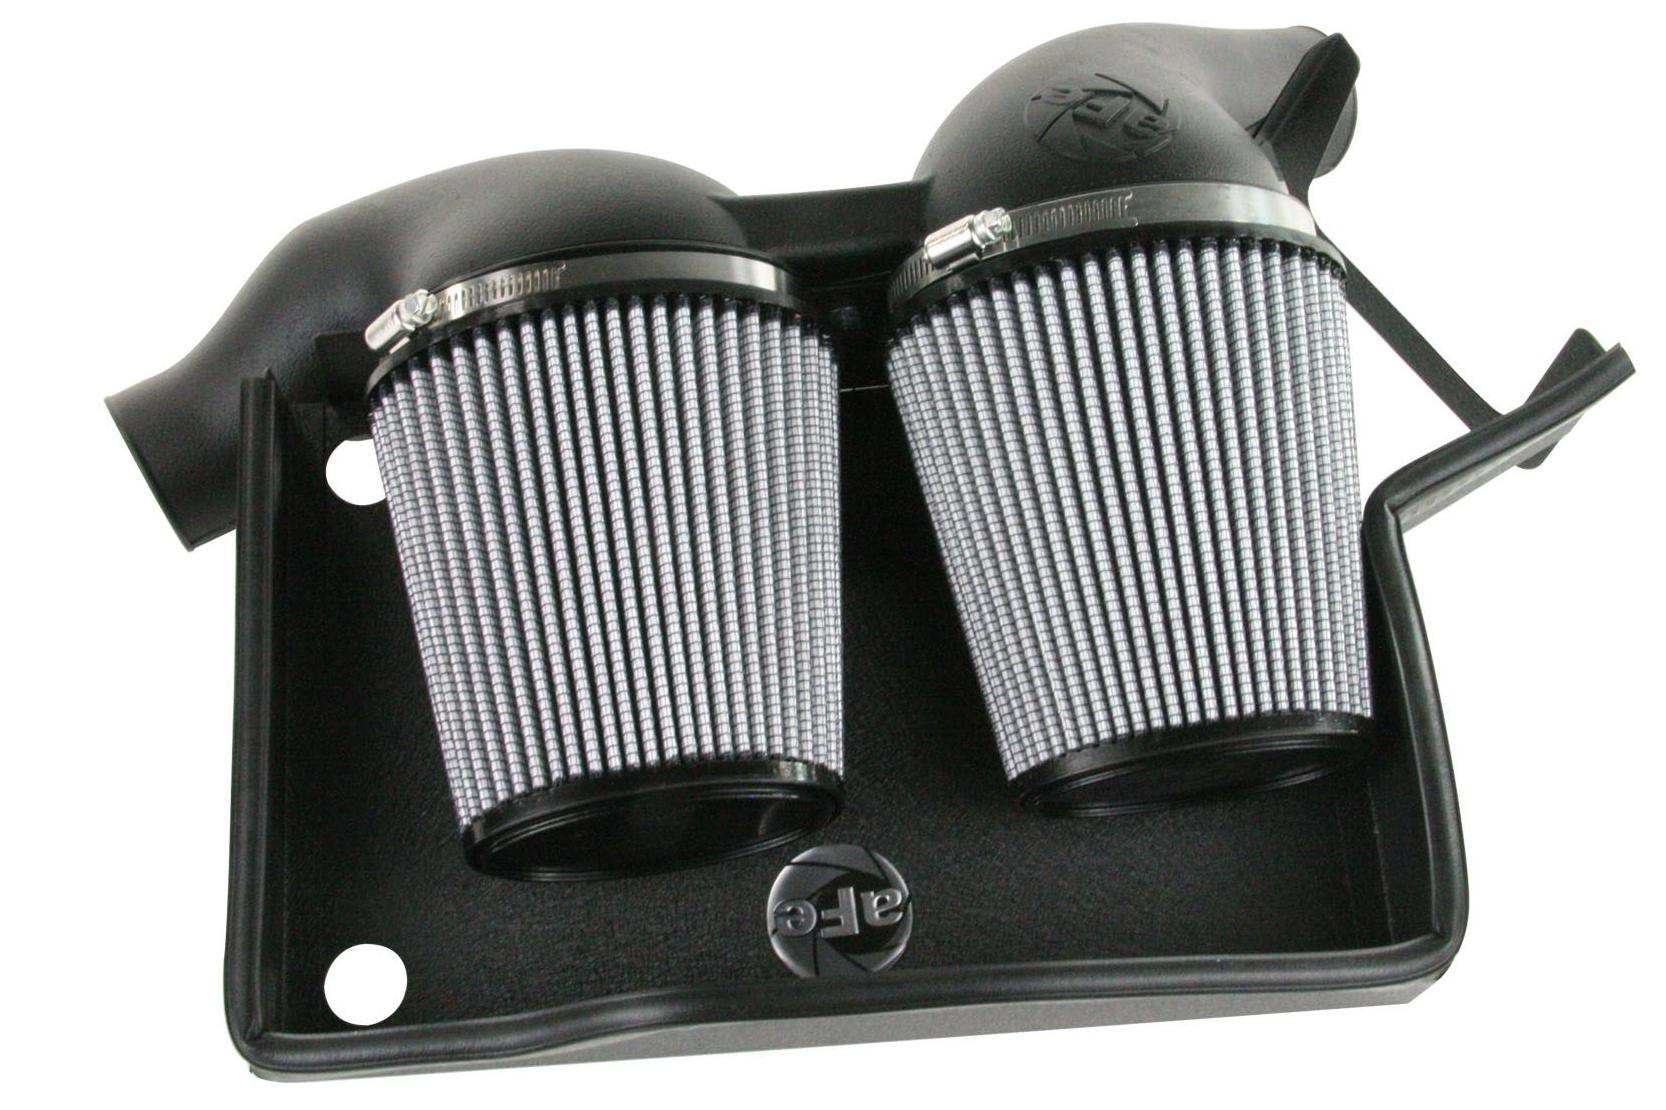 aFe Magnum FORCE Stage 2 Si Air Intake for 2006-10 BMW 135i/1M/335i/535i/Z4 N54 [E82/E90/E92/E60] 1